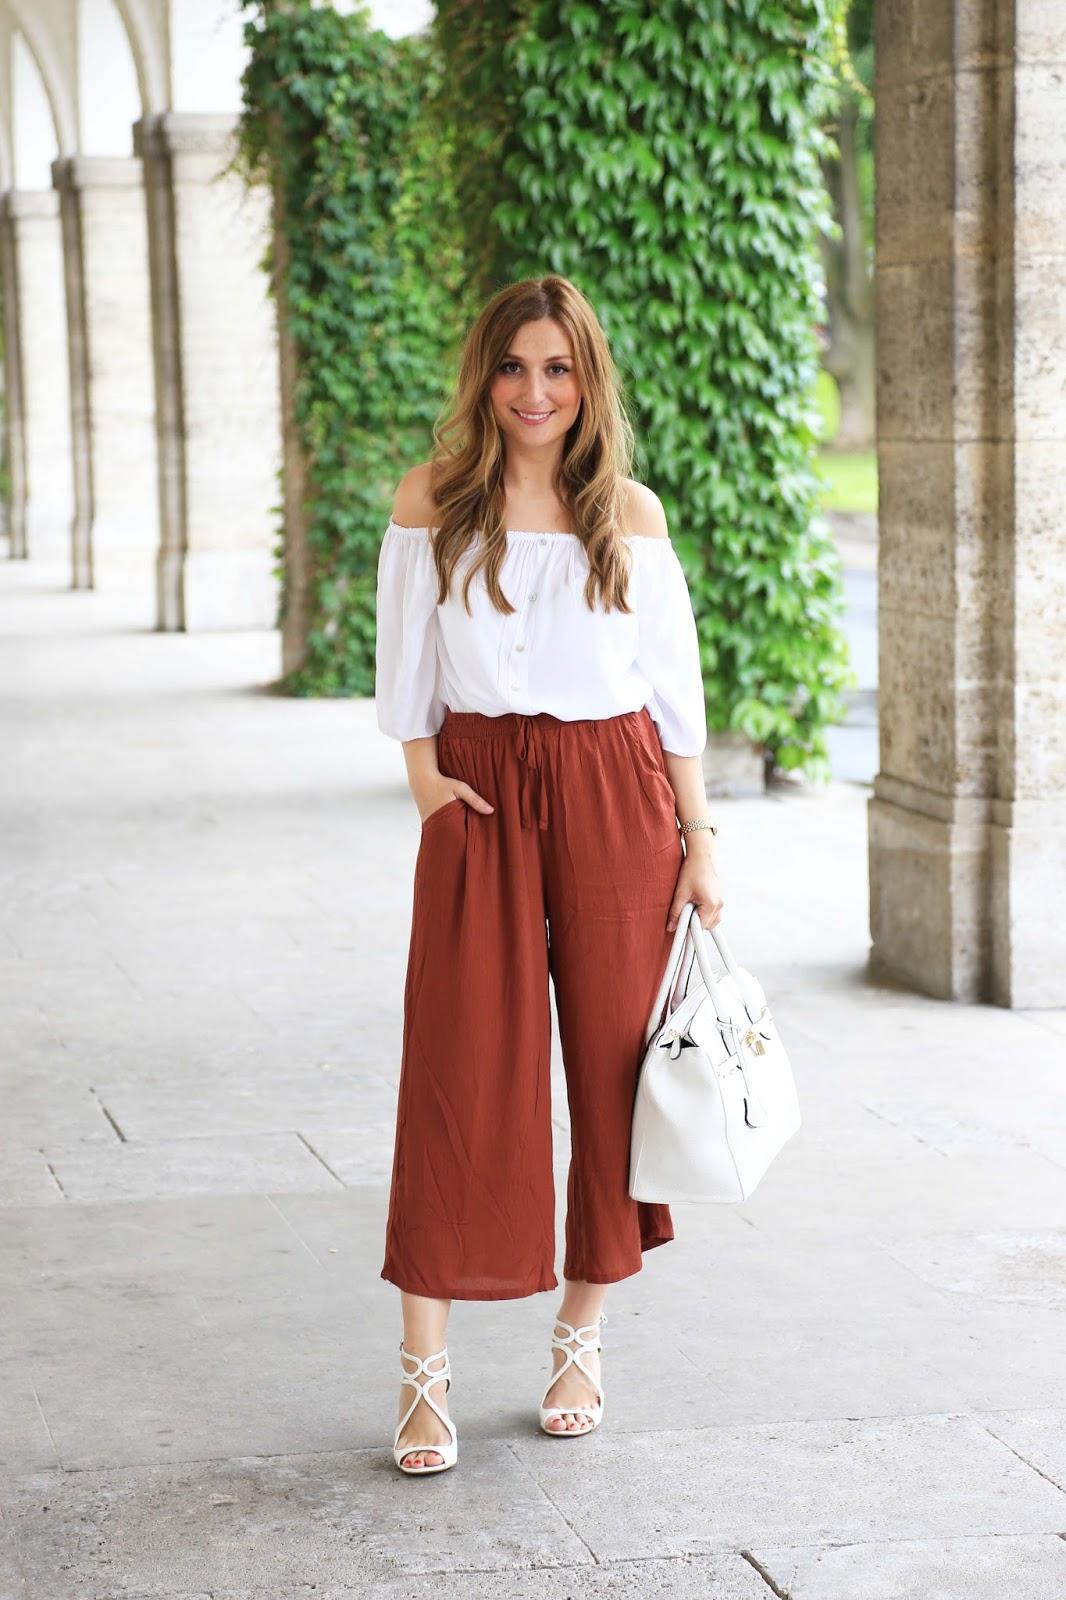 BloggerStyle - Fashionweek Berlin Lookinspiration - Blogger aus Frankfurt - Frankfurt Fashionblogger